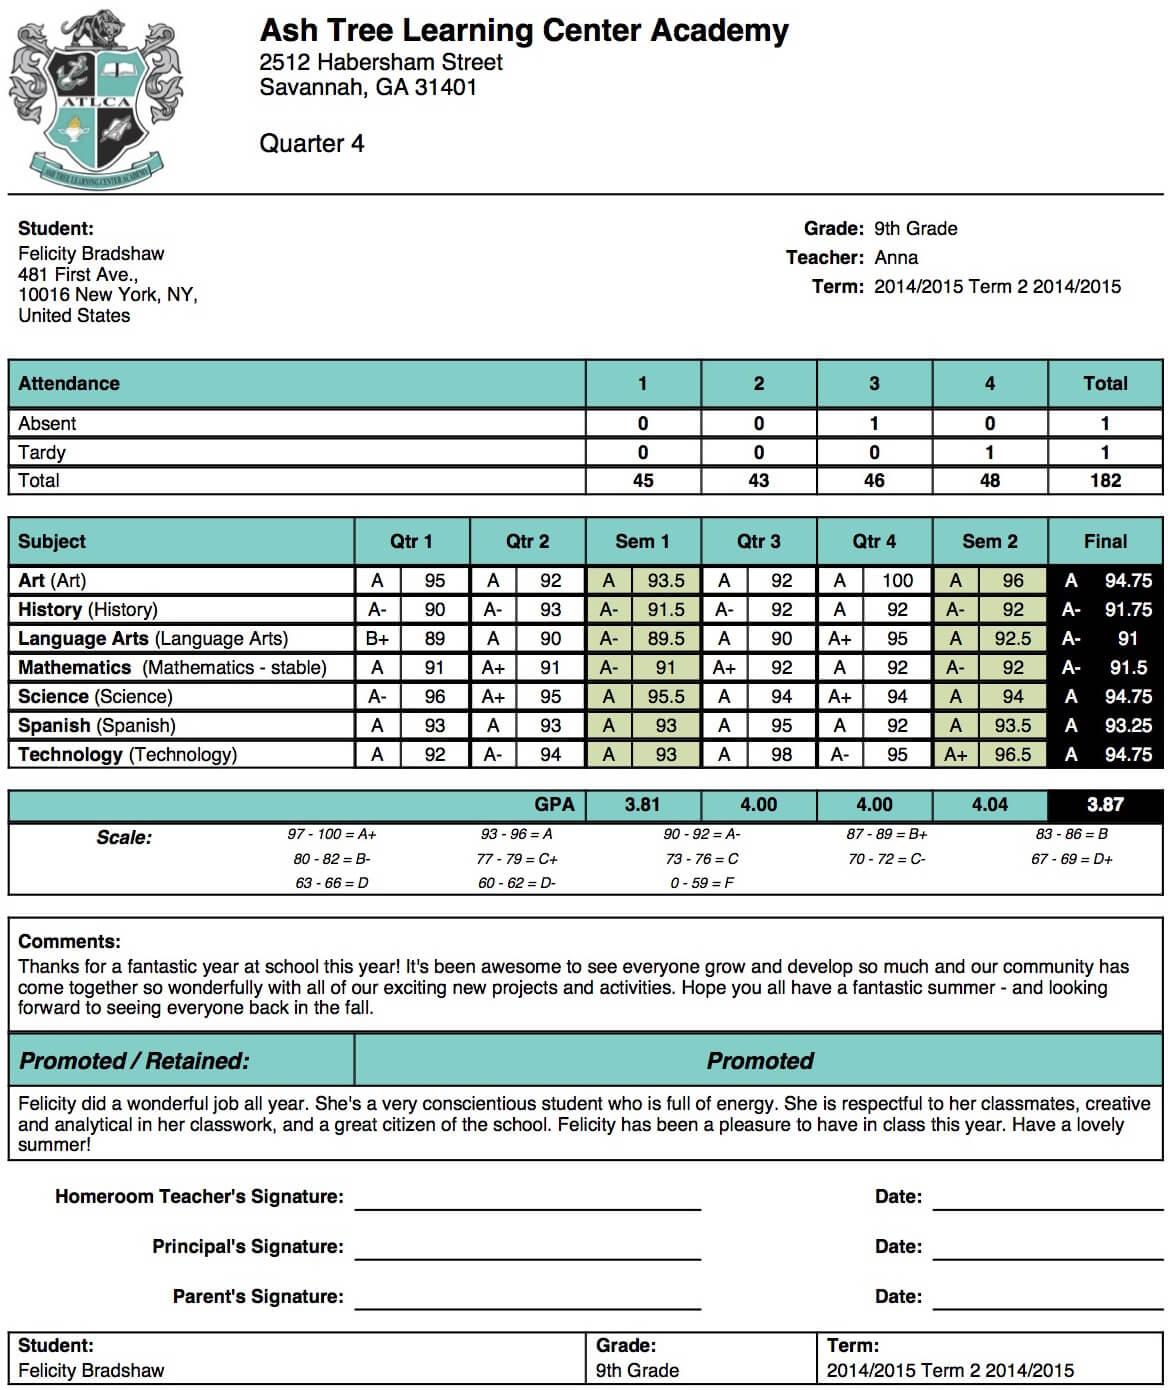 Ash Tree Learning Center Academy Report Card Template Regarding High School Report Card Template